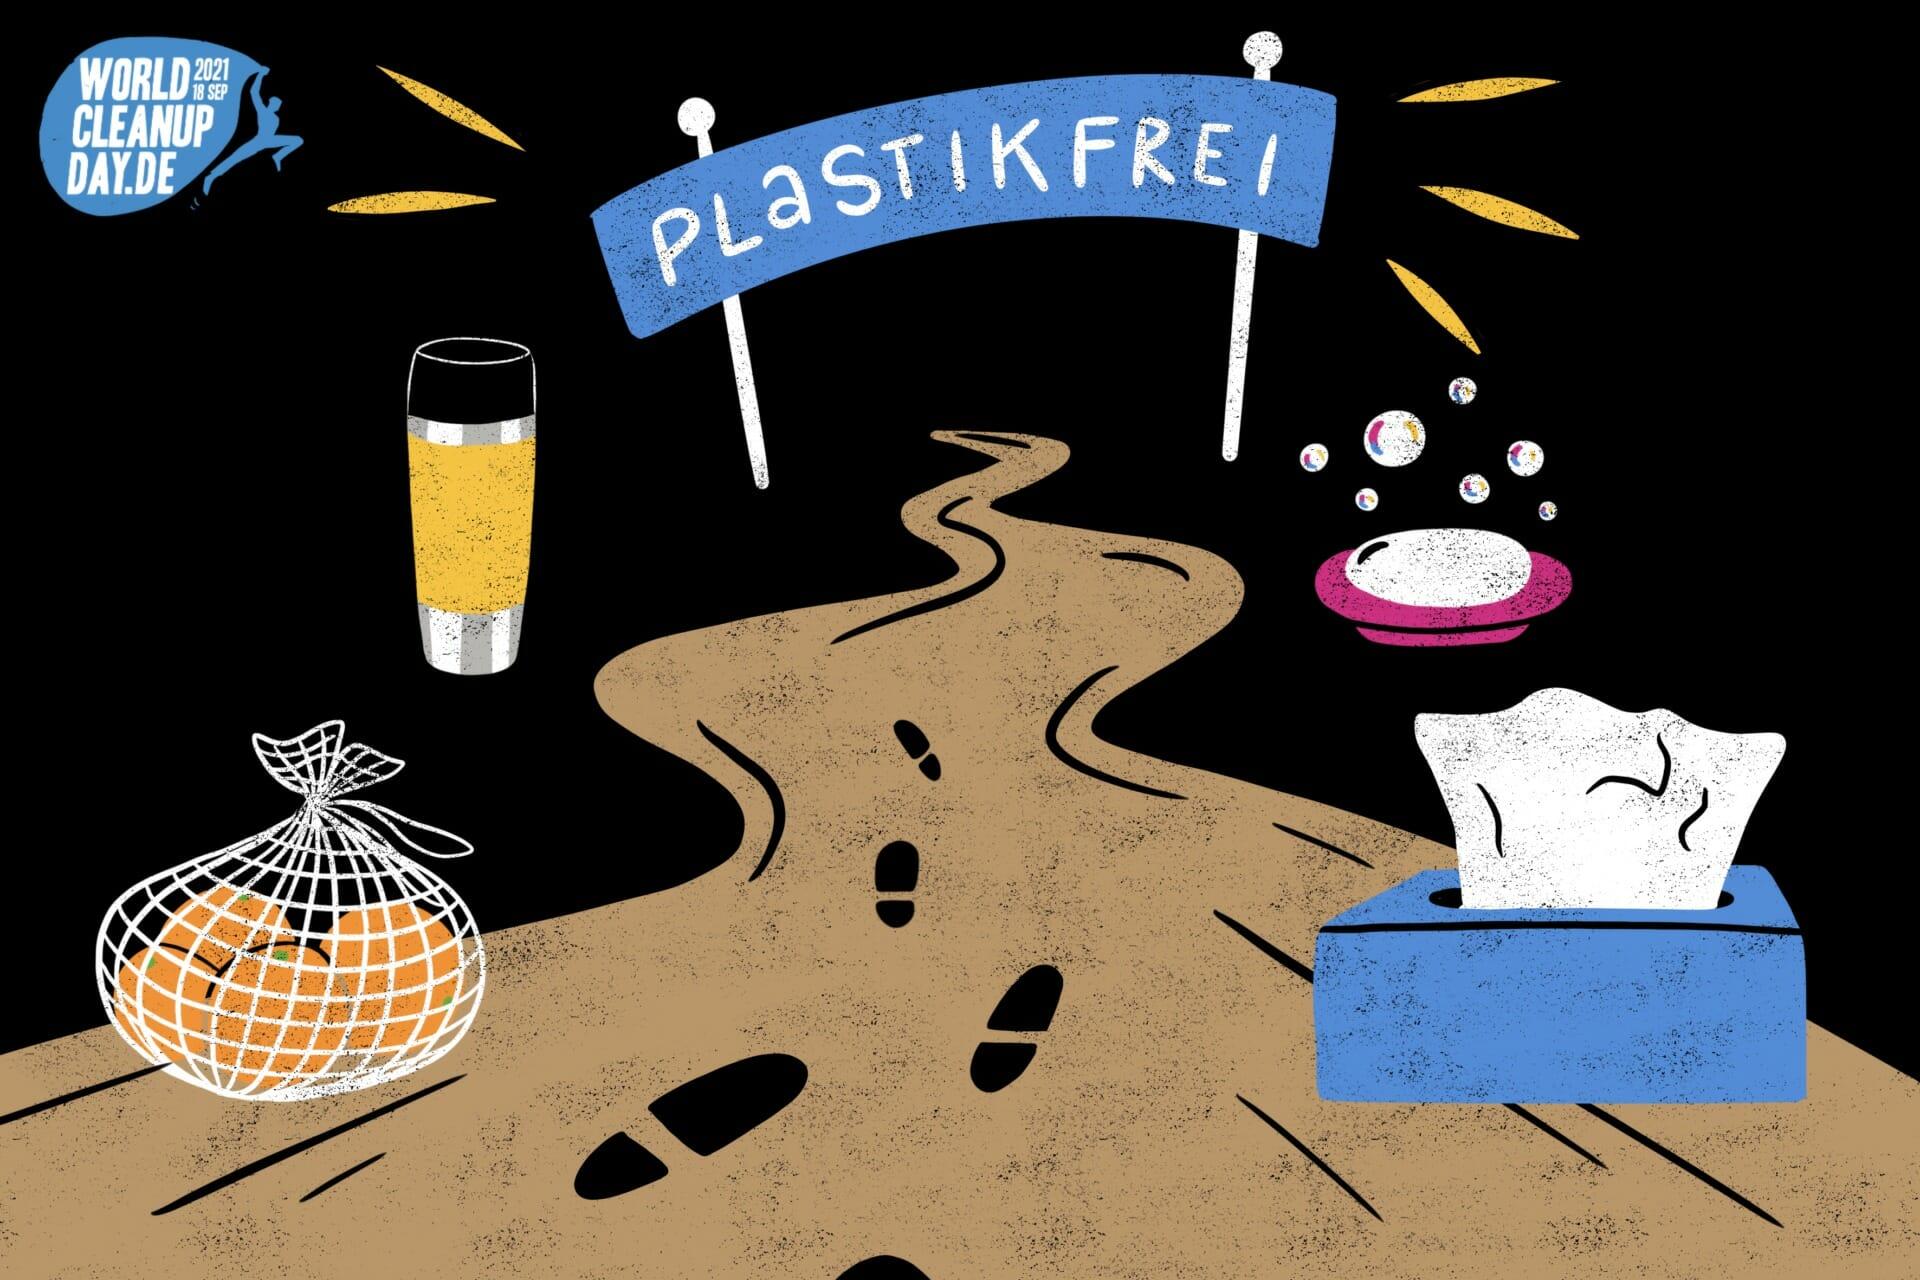 1. Schritt zu Plastikfrei